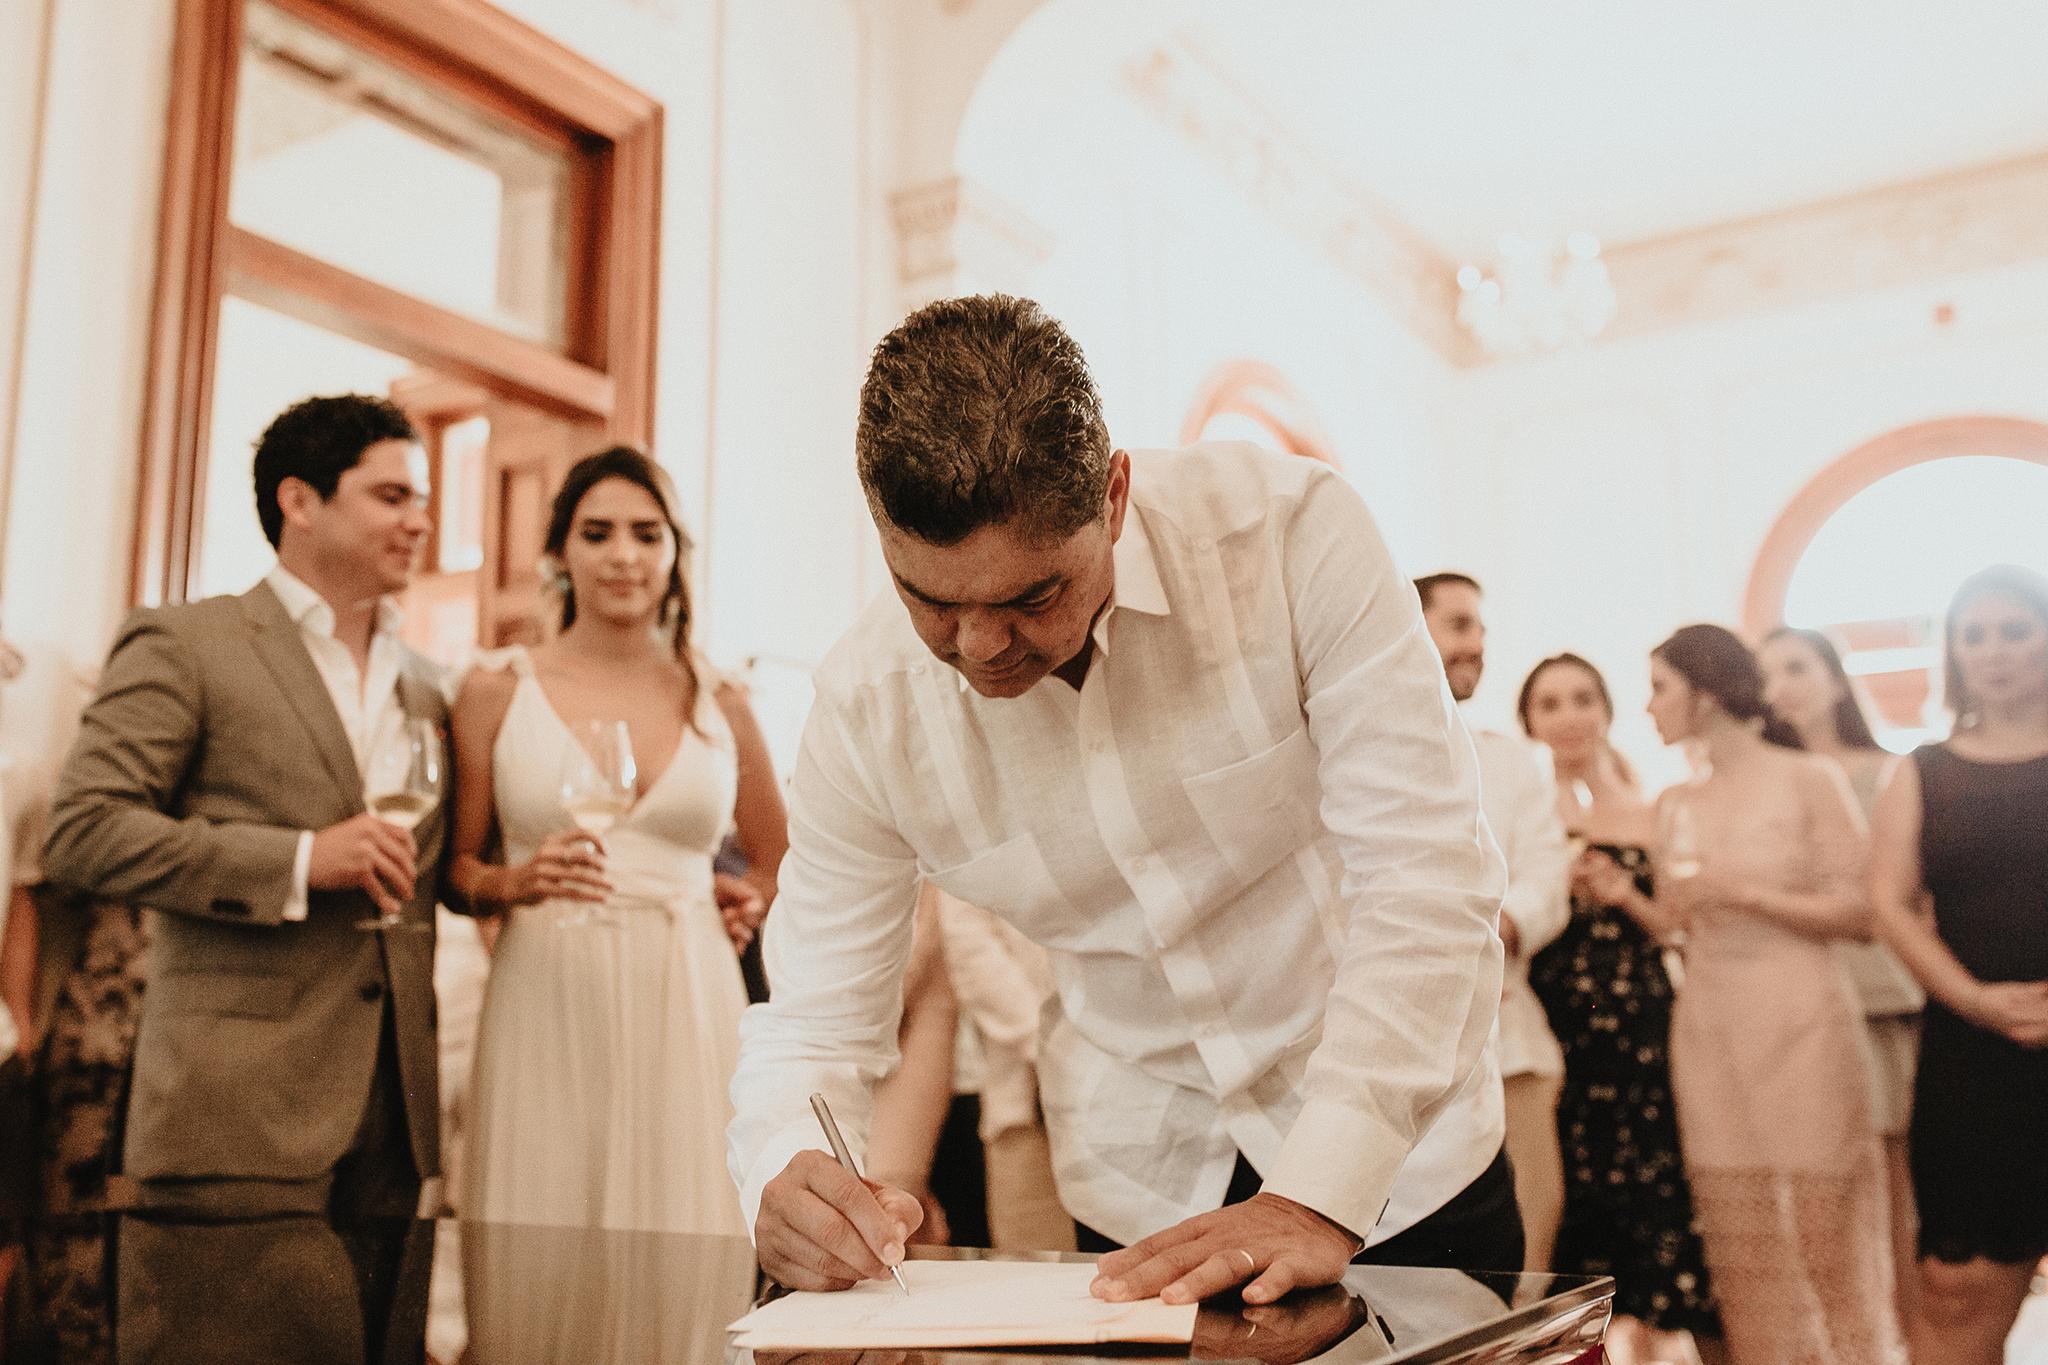 0124civil_Hacienda_WeddingDstination_MeridaYucatan_HaciendasMerida_BodasMexico_BodasYucatan_Boda_Destino.jpg